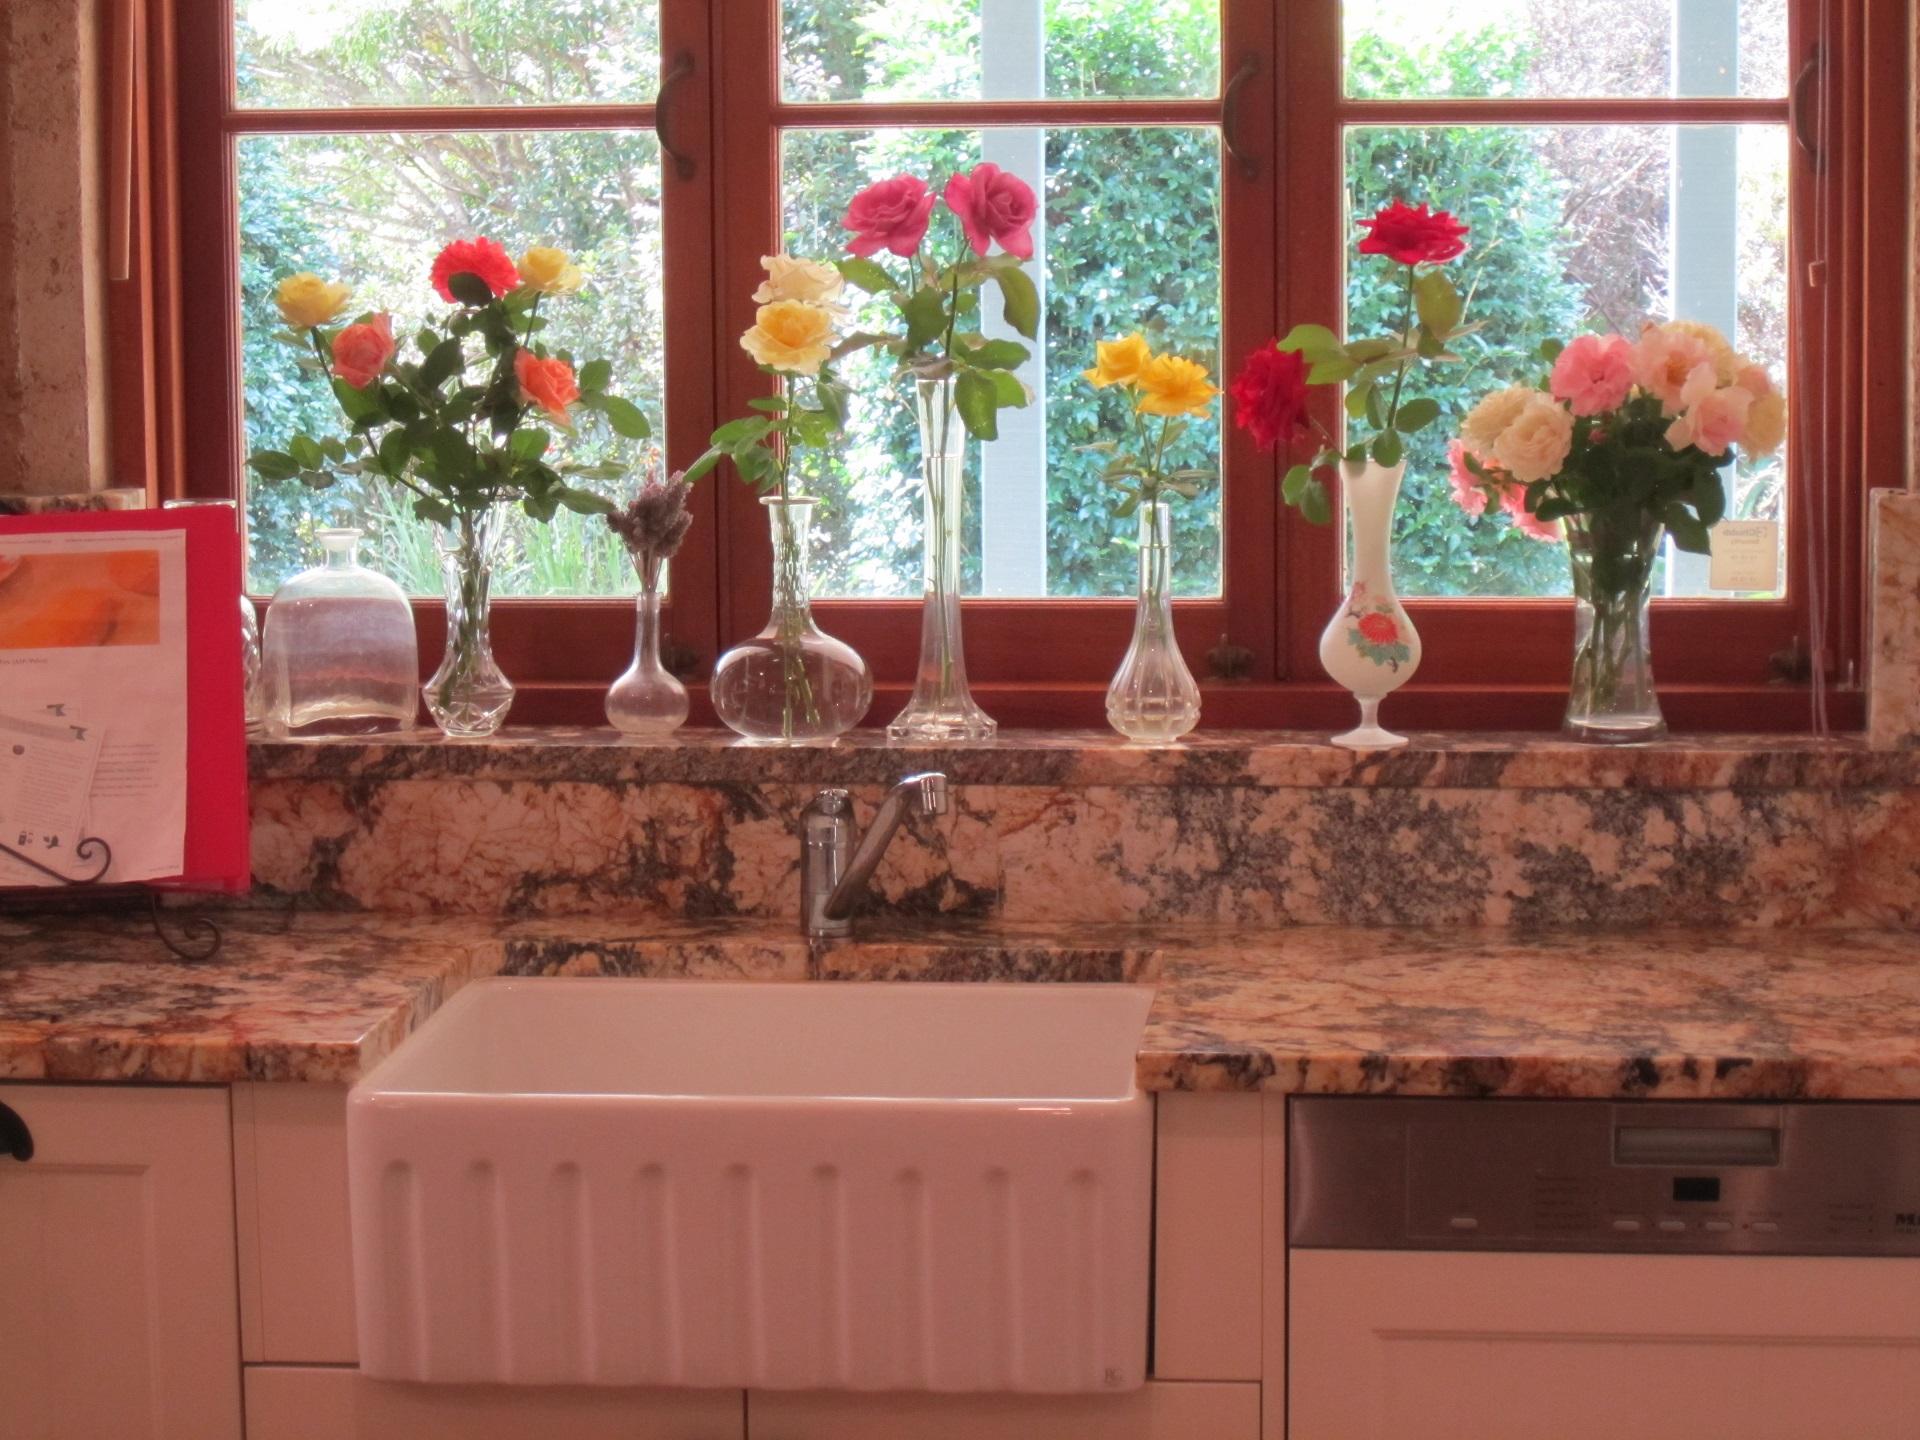 Brisbane Kitchen Design Samford  Traditional Kitchen Renovation Butlers Sink (6)